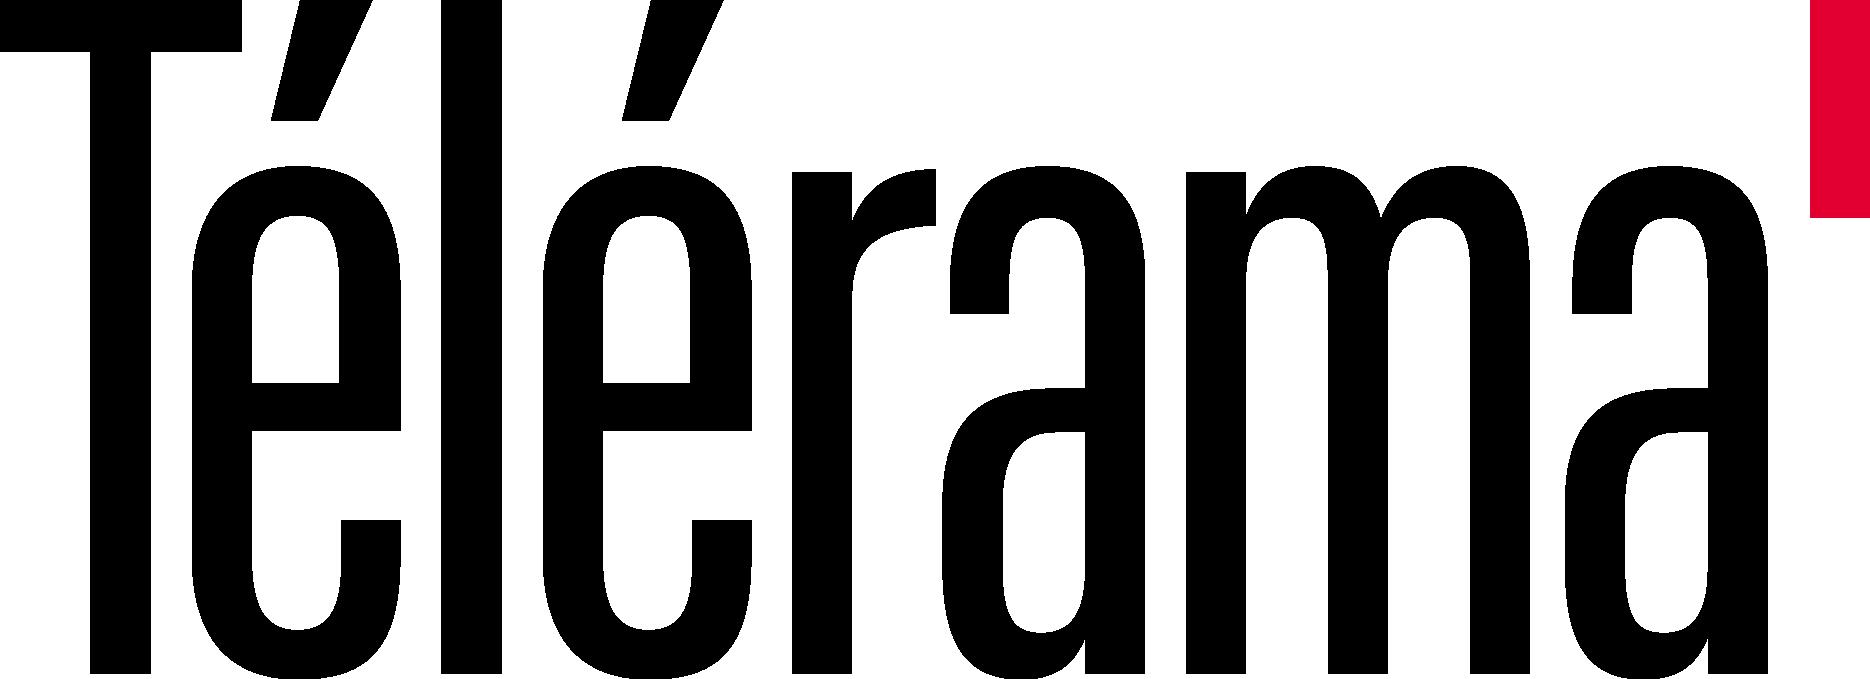 Télephone information entreprise  Télérama